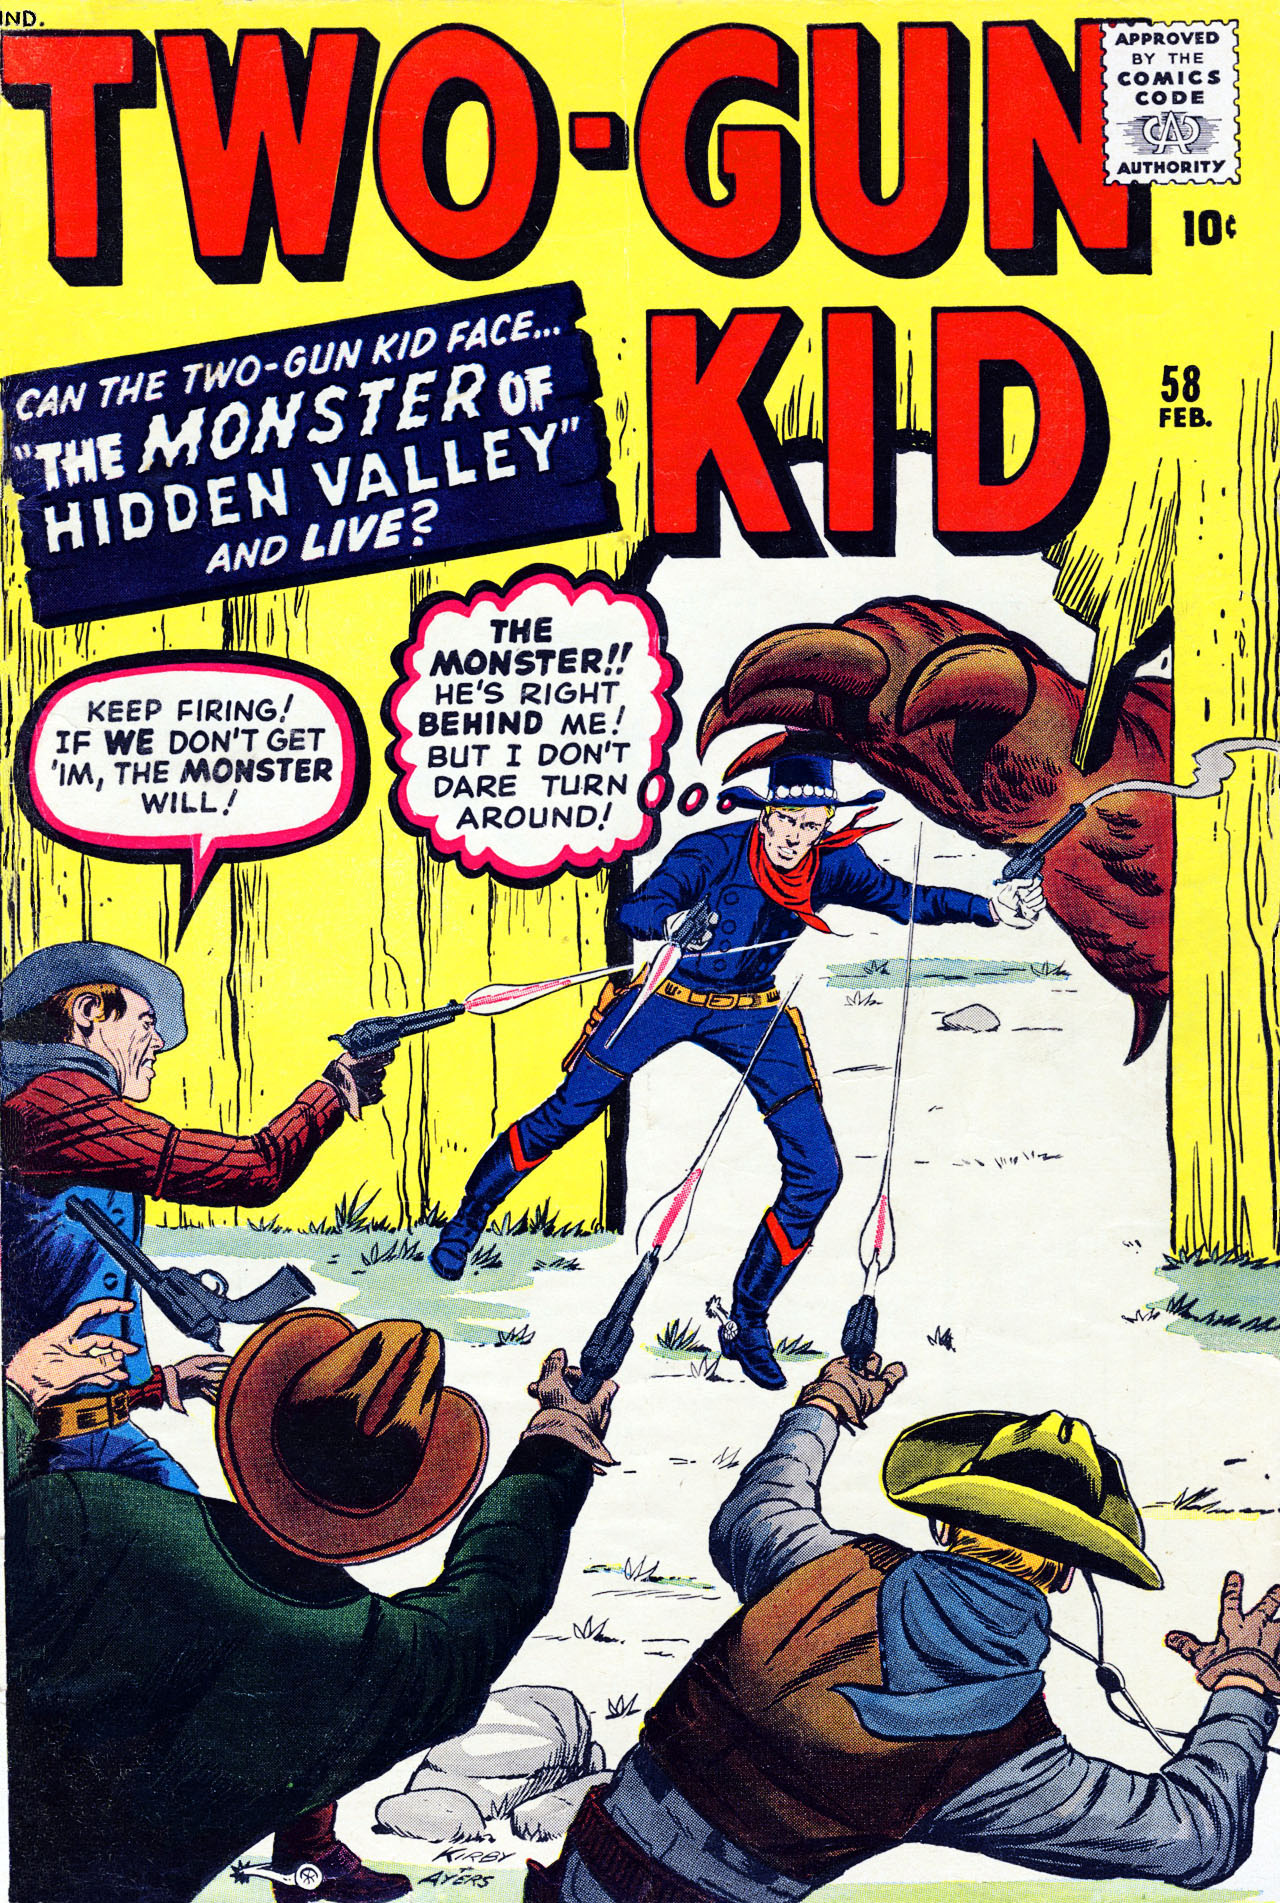 Read online Two-Gun Kid comic -  Issue #58 - 1